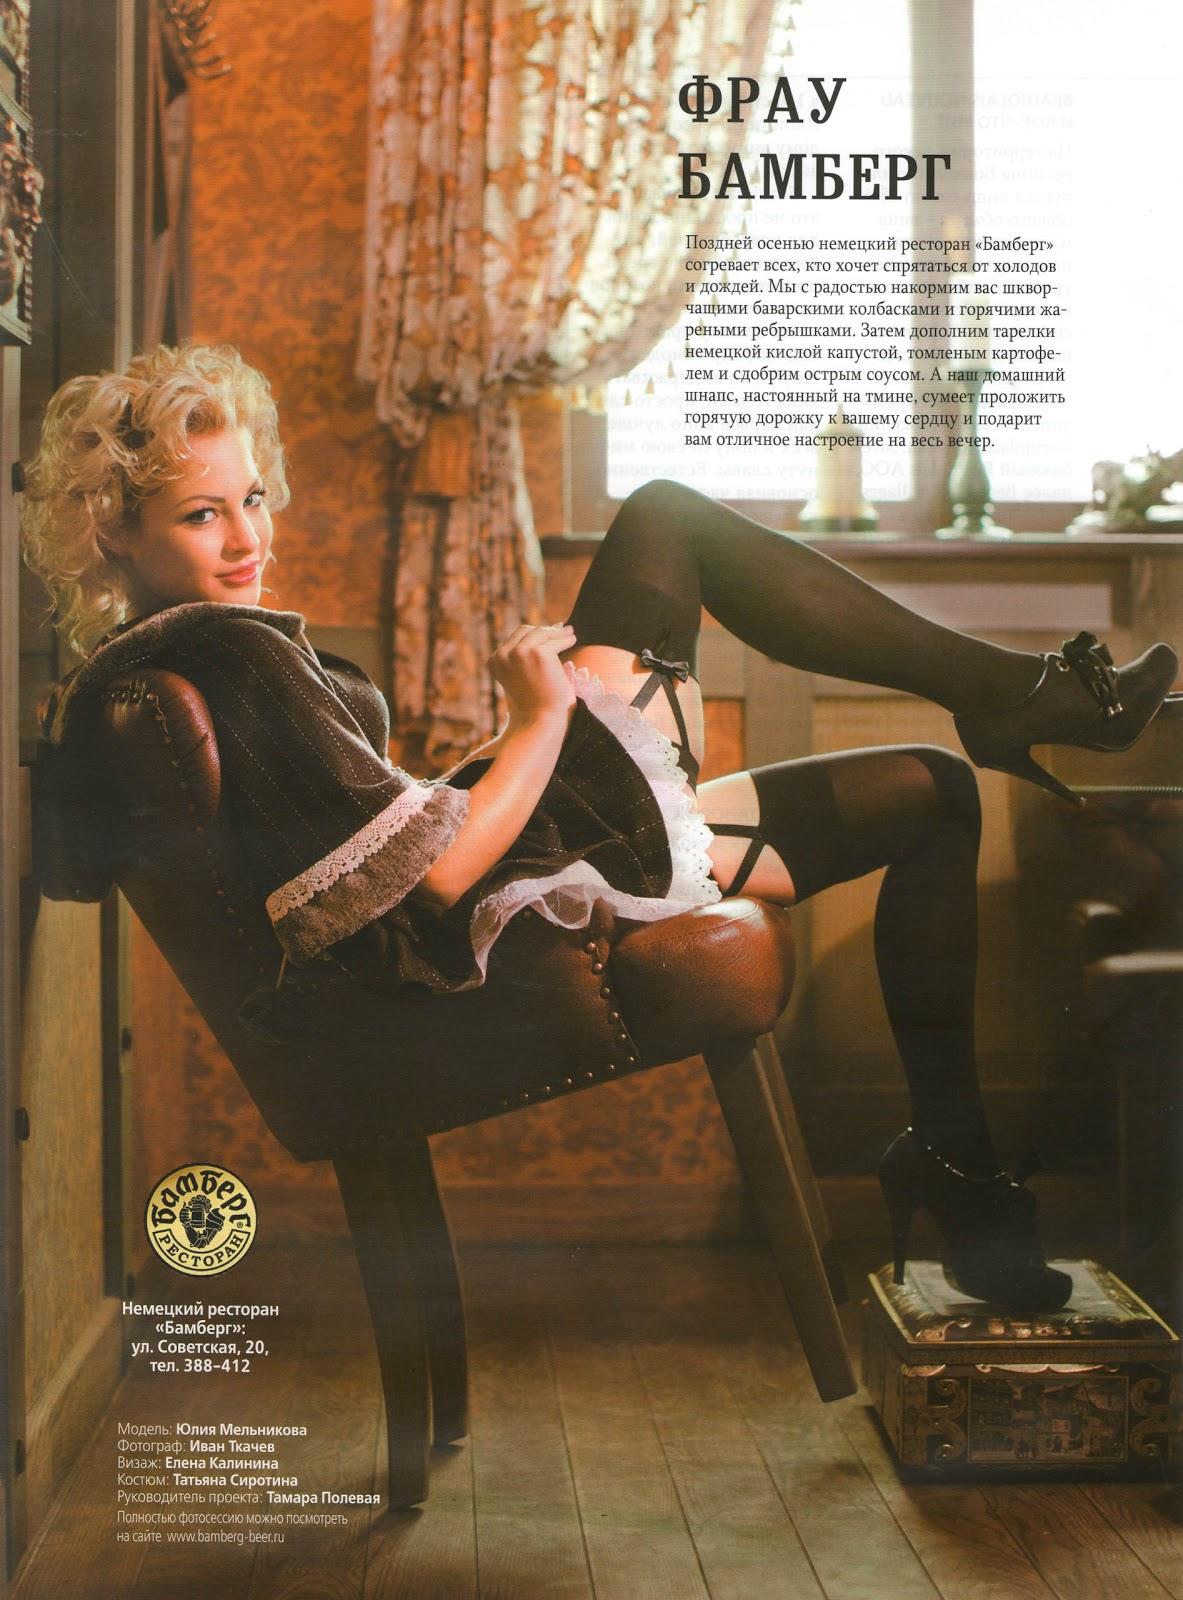 Юлия зимина фото в журнале 15 фотография